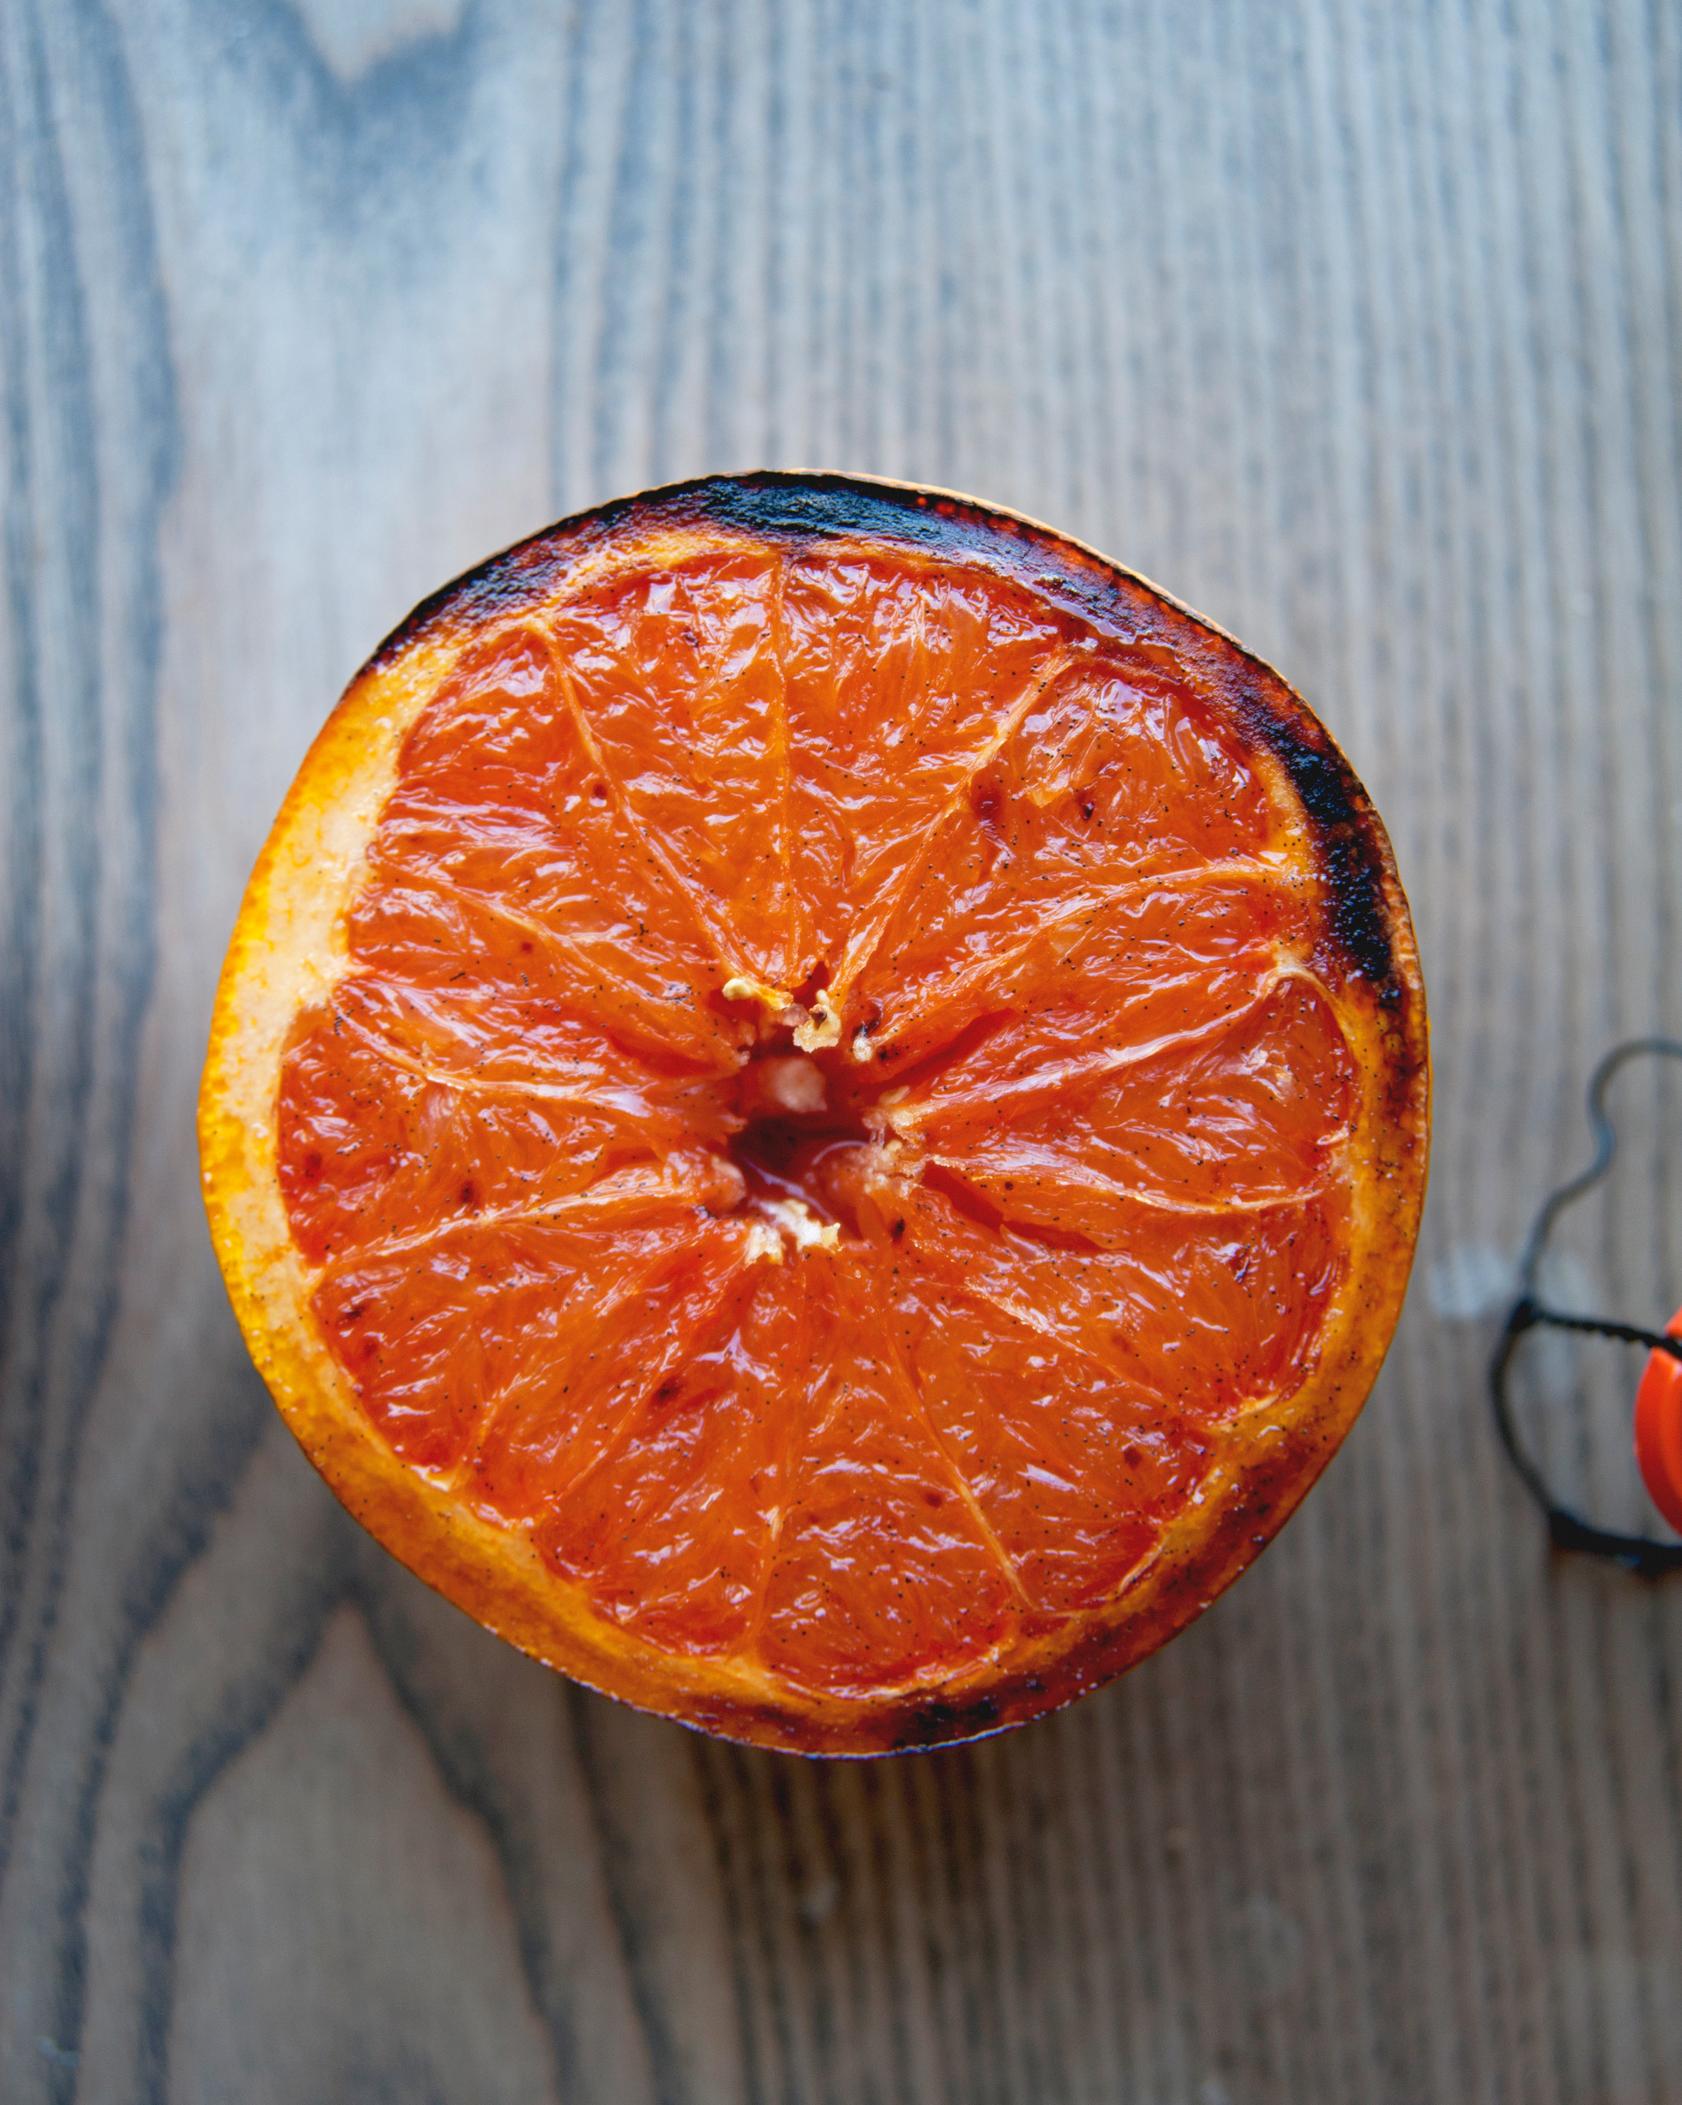 claire-thomas-bridal-shower-garden-food-grapefruit-0814.jpg